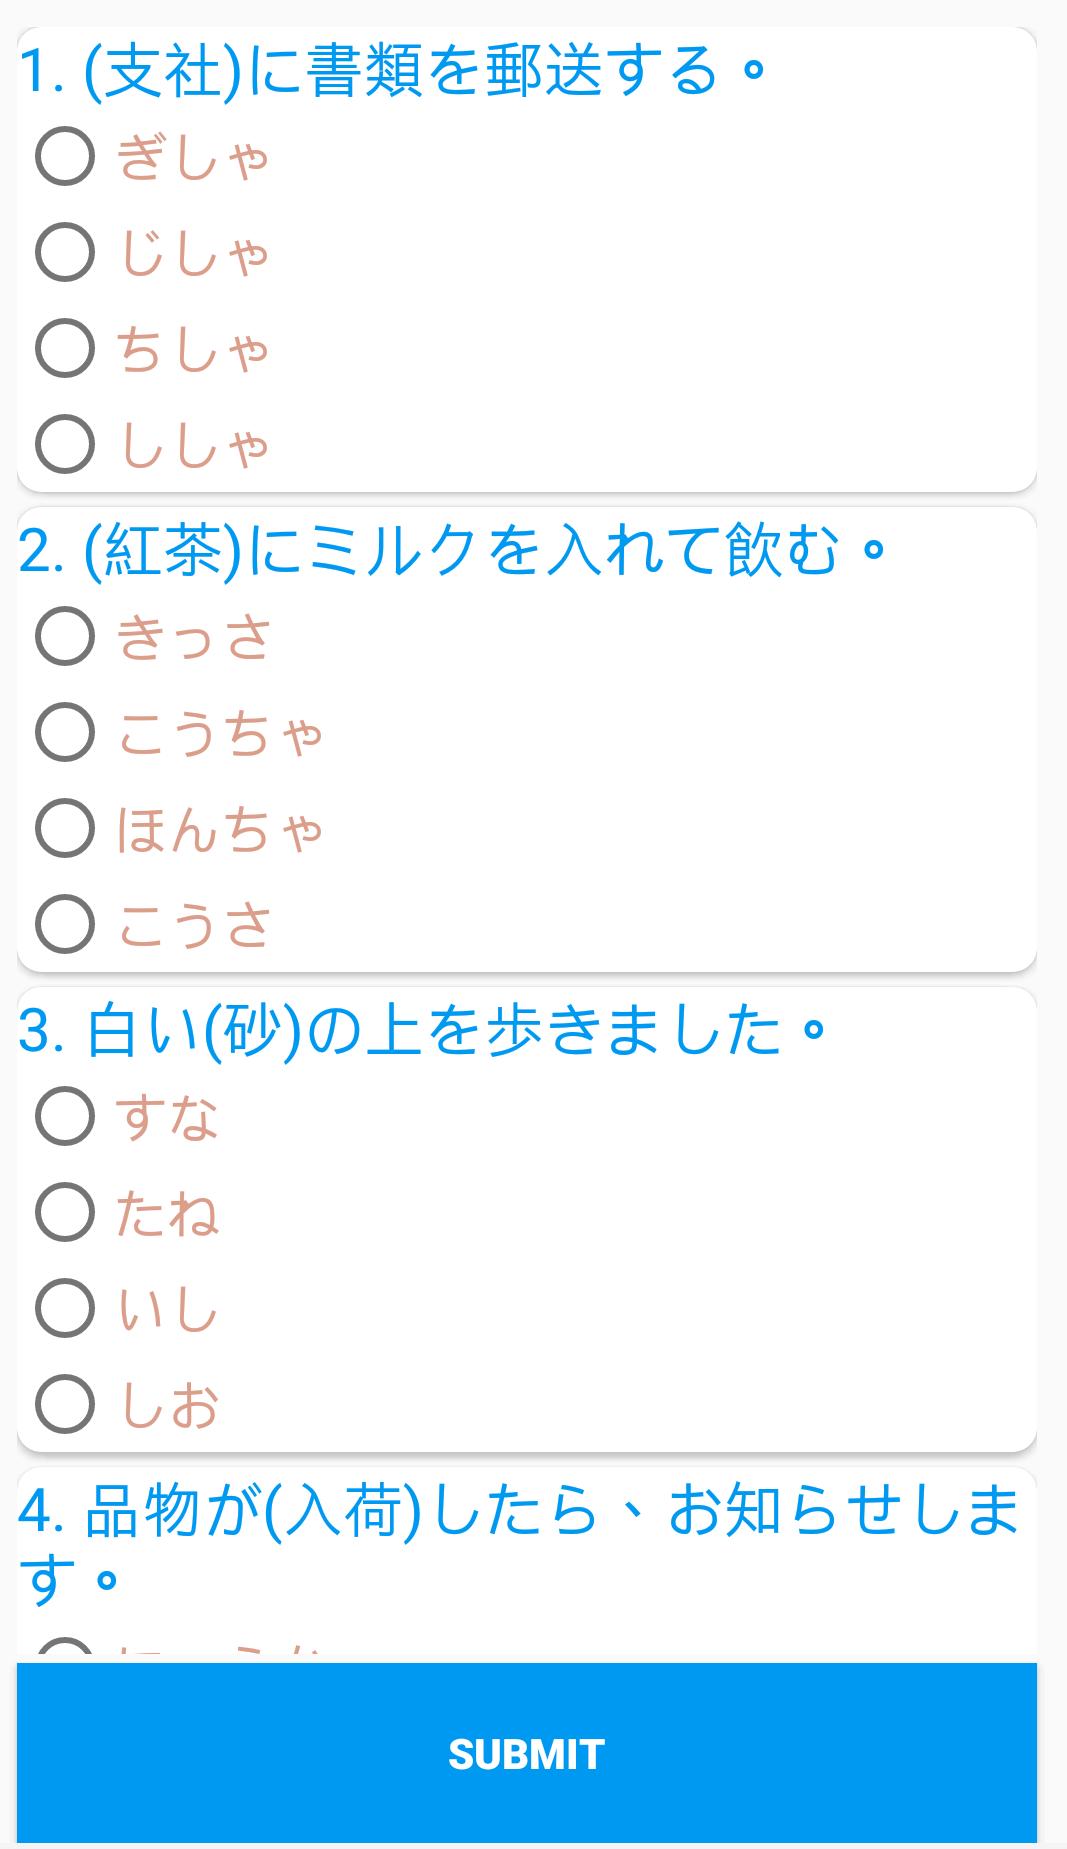 JLPT N3test example